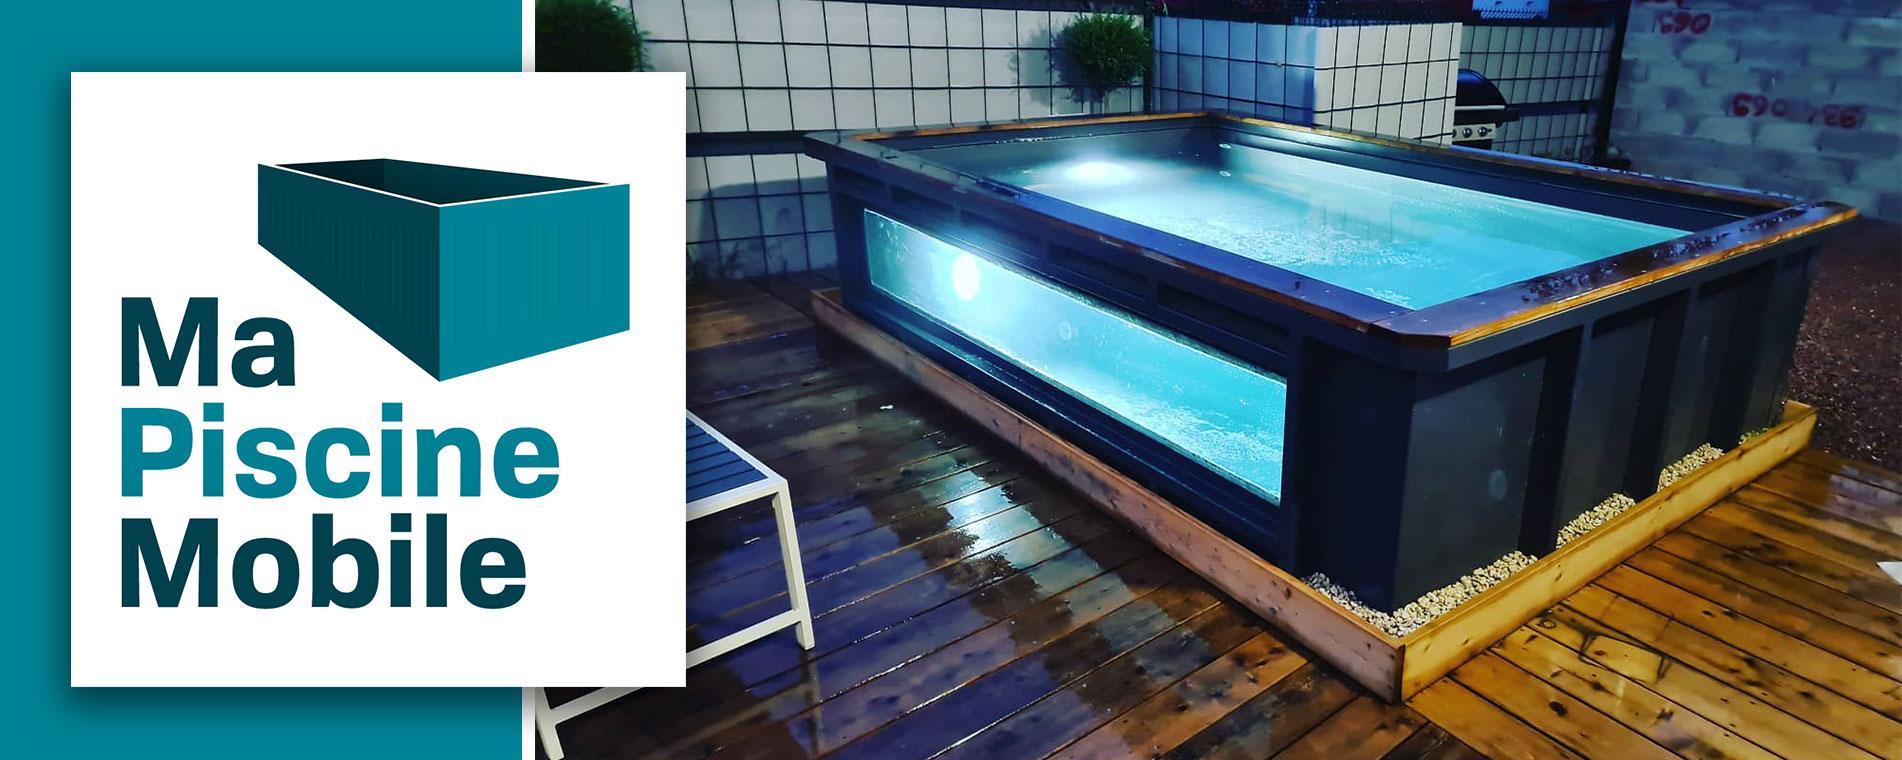 Netbox: Ma piscine container